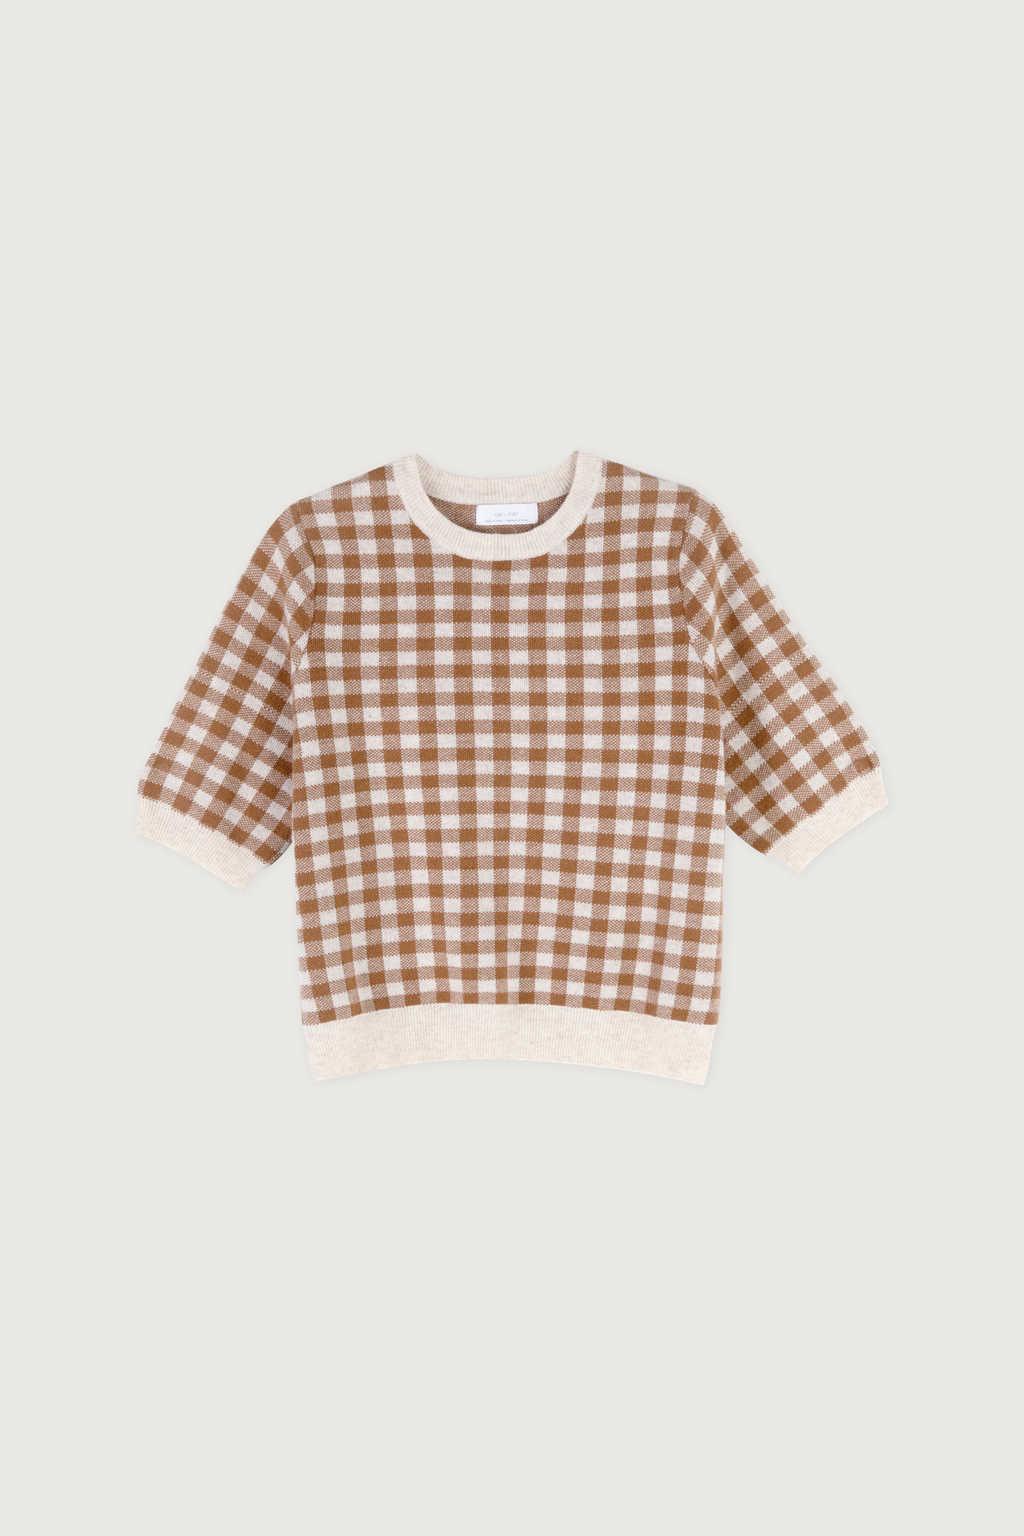 Sweater 3165 Camel 8